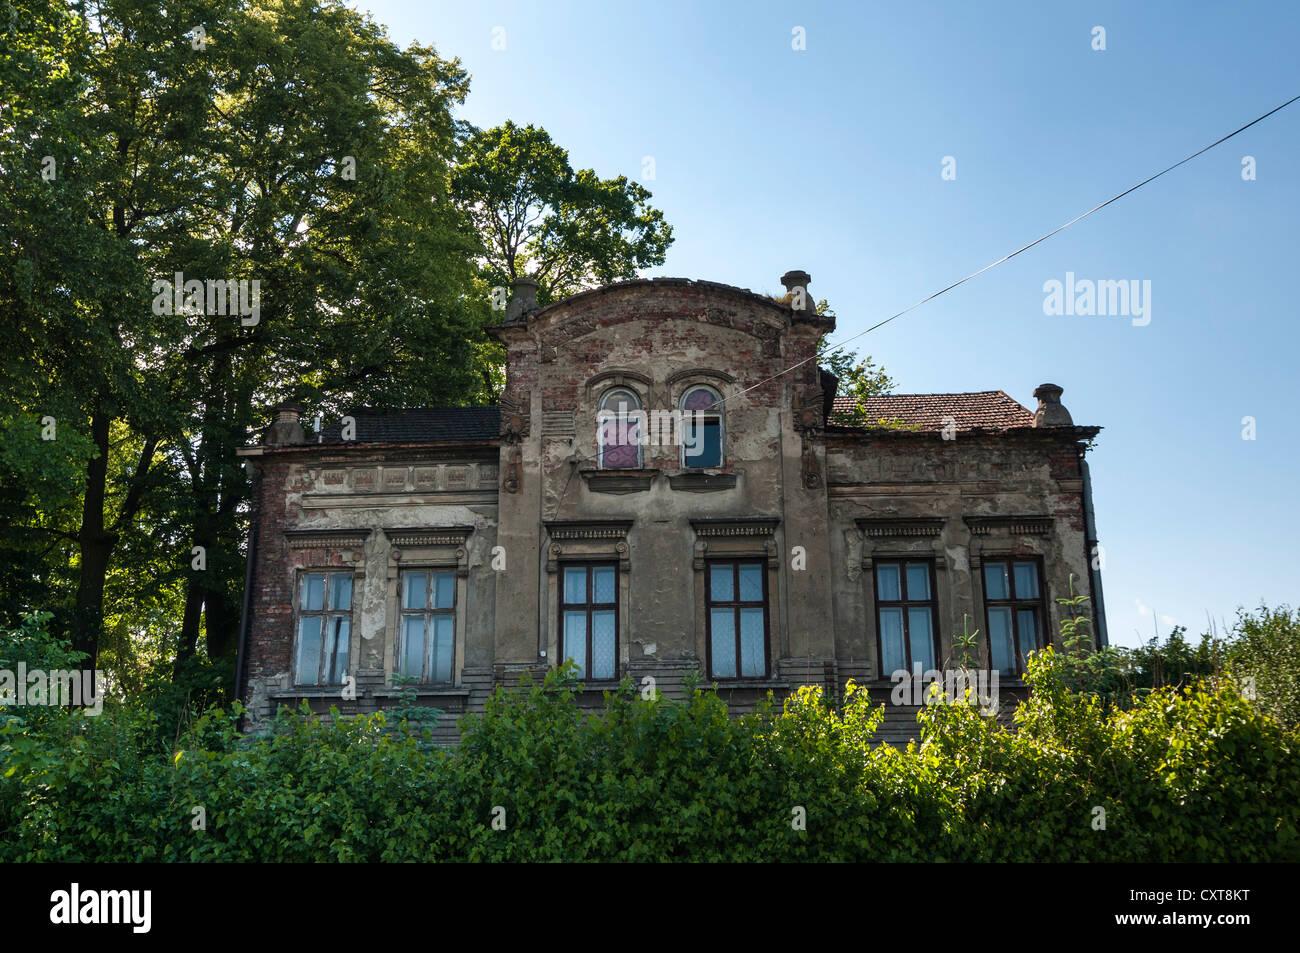 Dilapidated apartment building, Auschwitz, Oświęcim, Lesser Poland, Poland, Europe - Stock Image